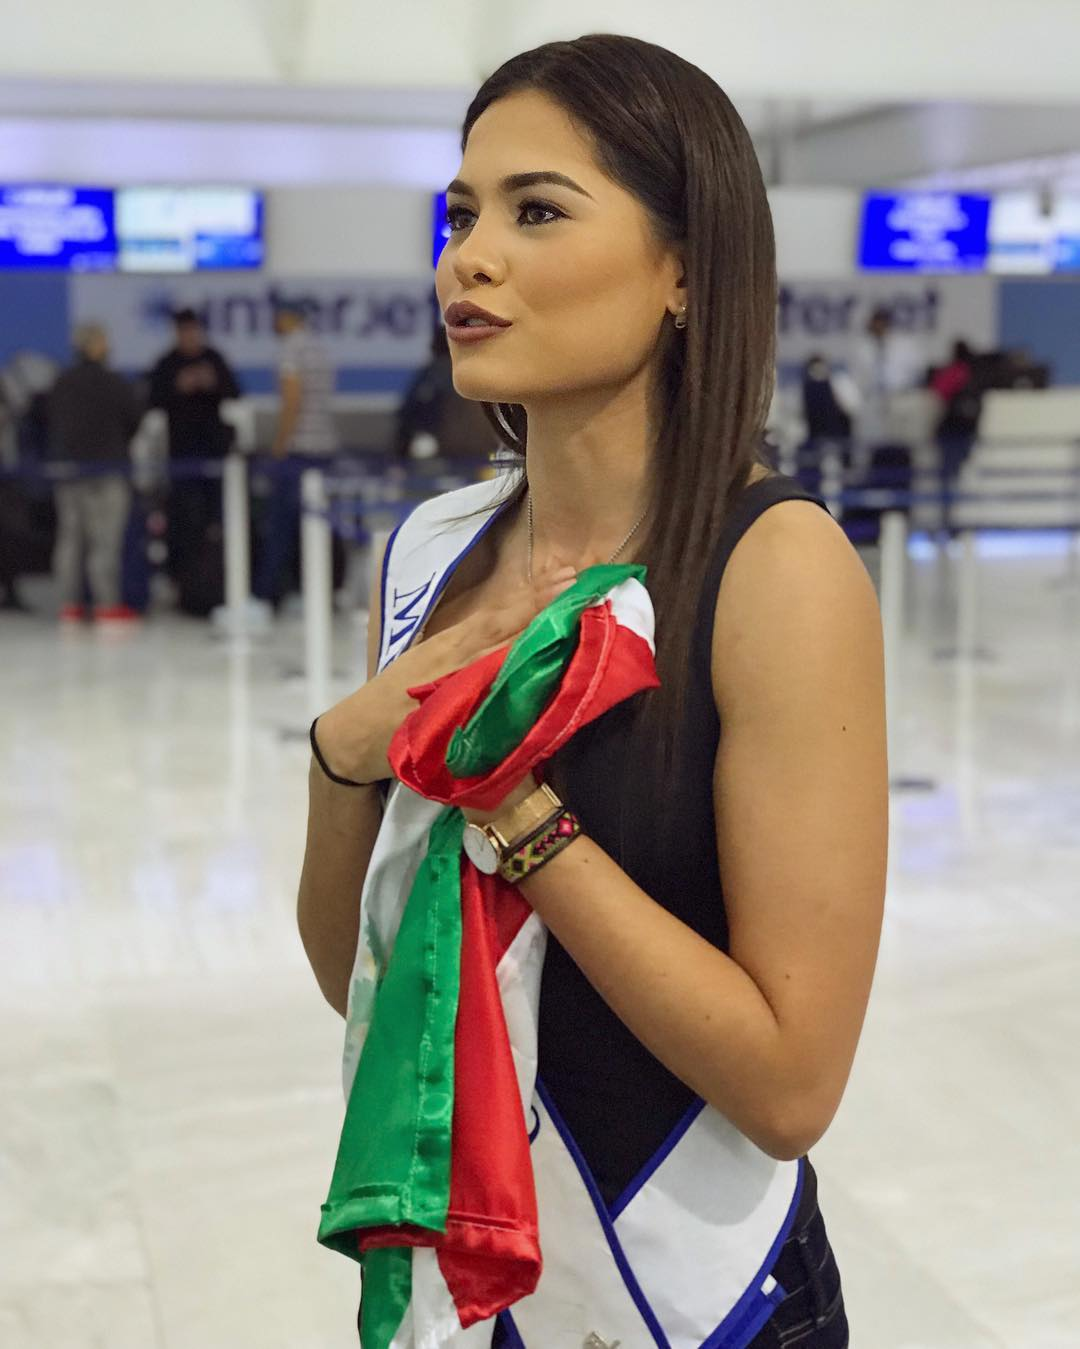 andrea meza, mexicana universal chihuahua 2020/1st runner-up de miss world 2017. - Página 21 22580824_544579852577979_6243586003915767808_n